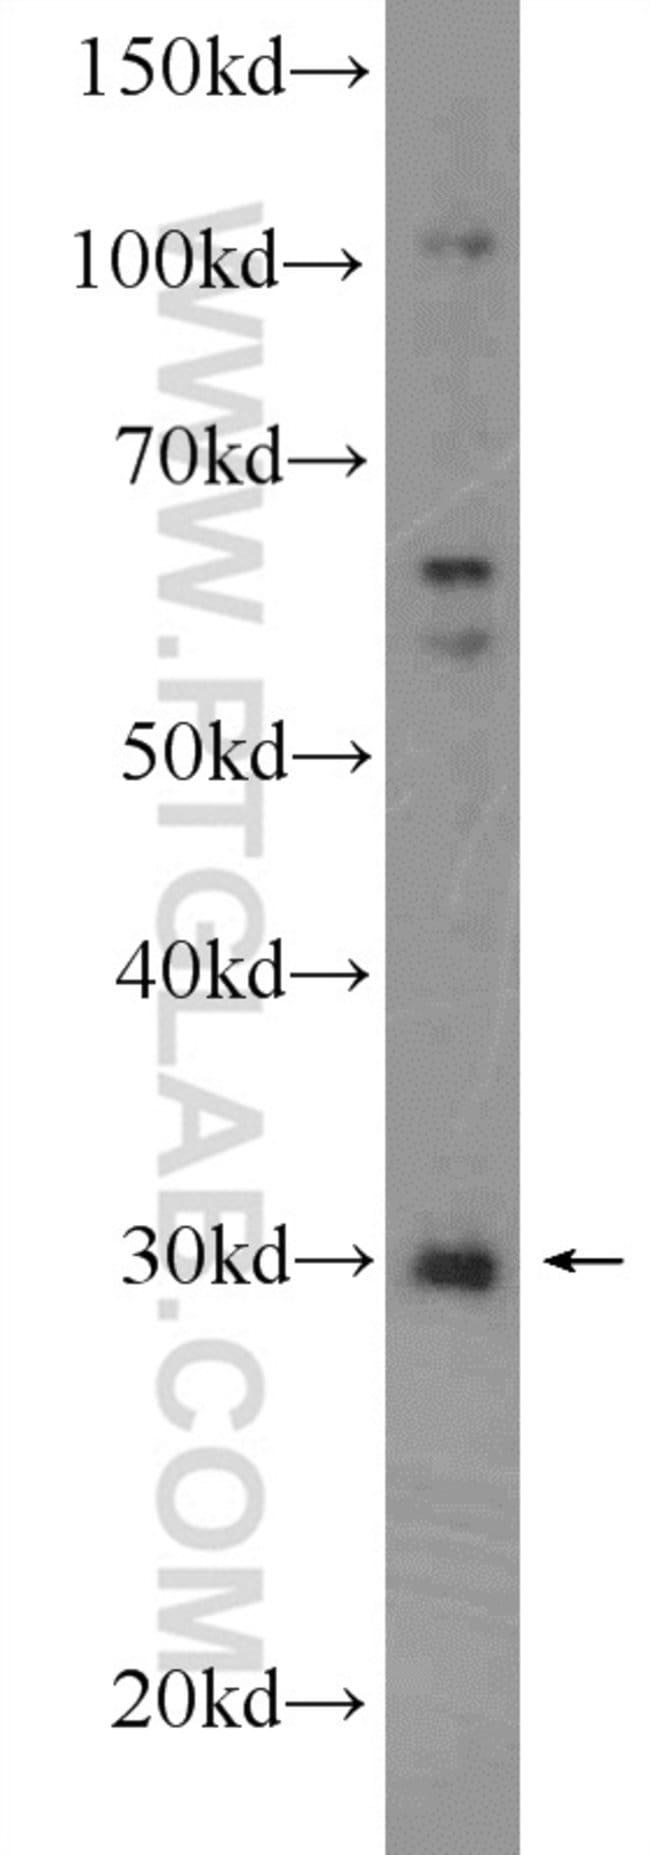 SIRT5 Rabbit anti-Human, Mouse, Rat, Polyclonal, Proteintech 150 μL; Unconjugated Produkte